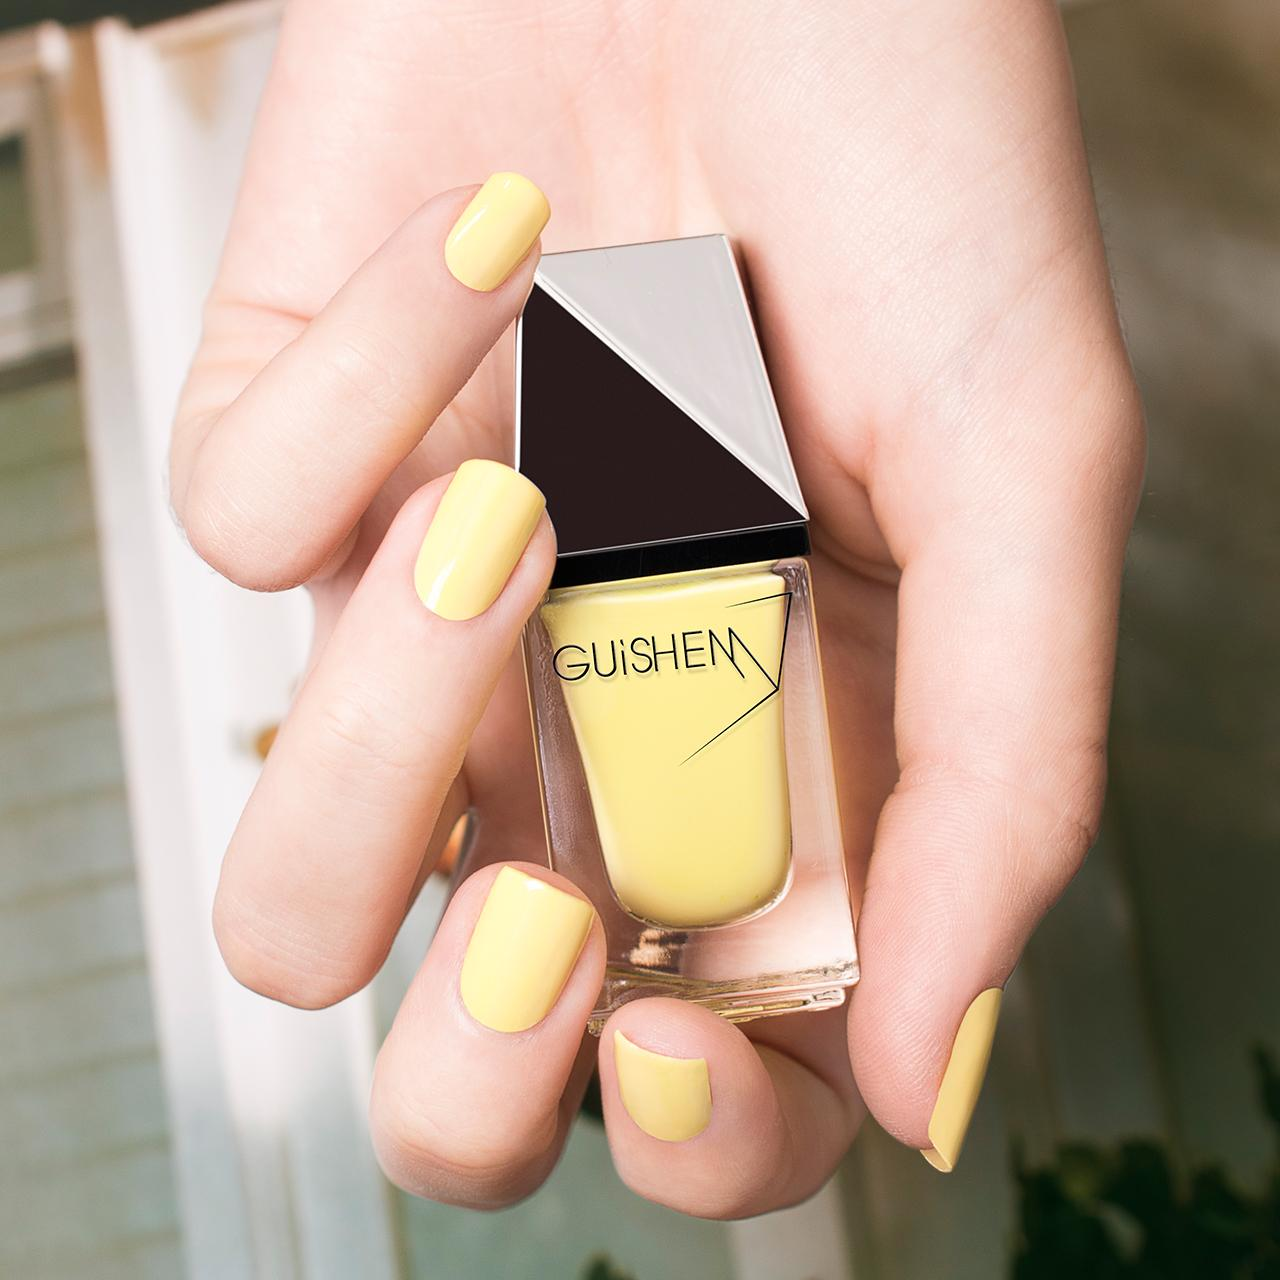 GUiSHEM Premium Nail Lacquer Crème Baby Yellow, Aurora - 210